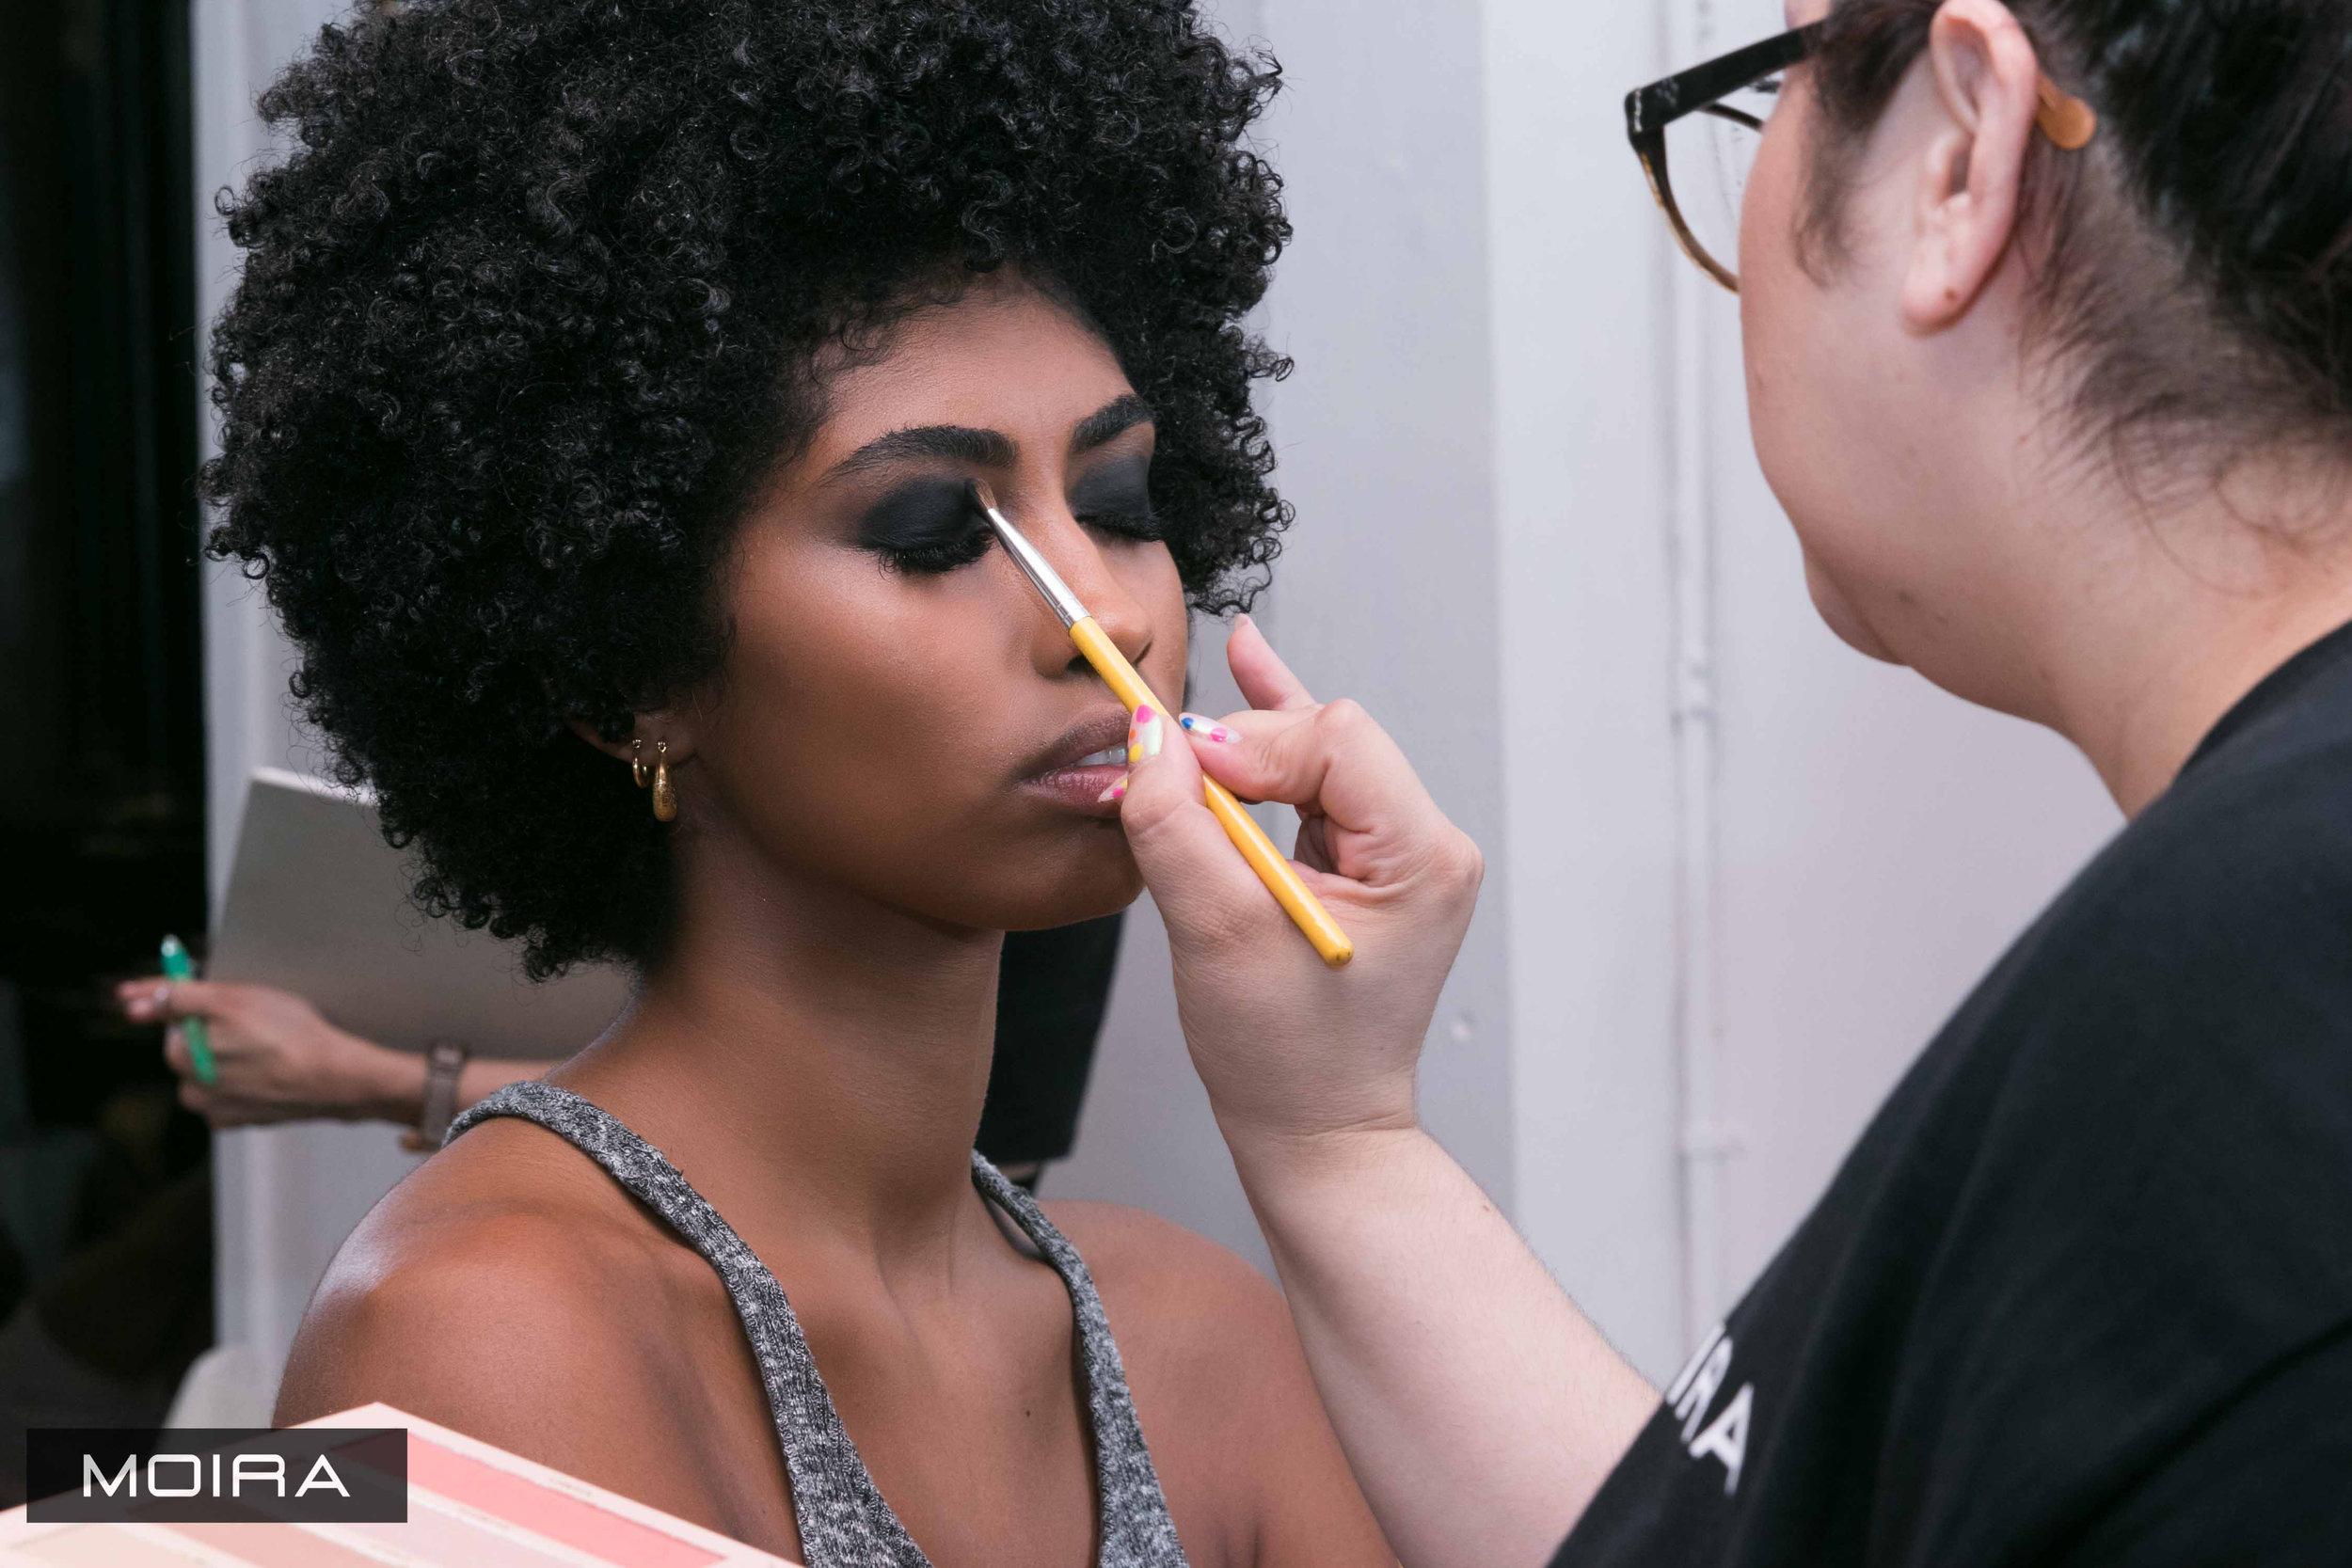 MOIRA_Cosmetics_New_York_Fashion_Week_2018-11.jpg